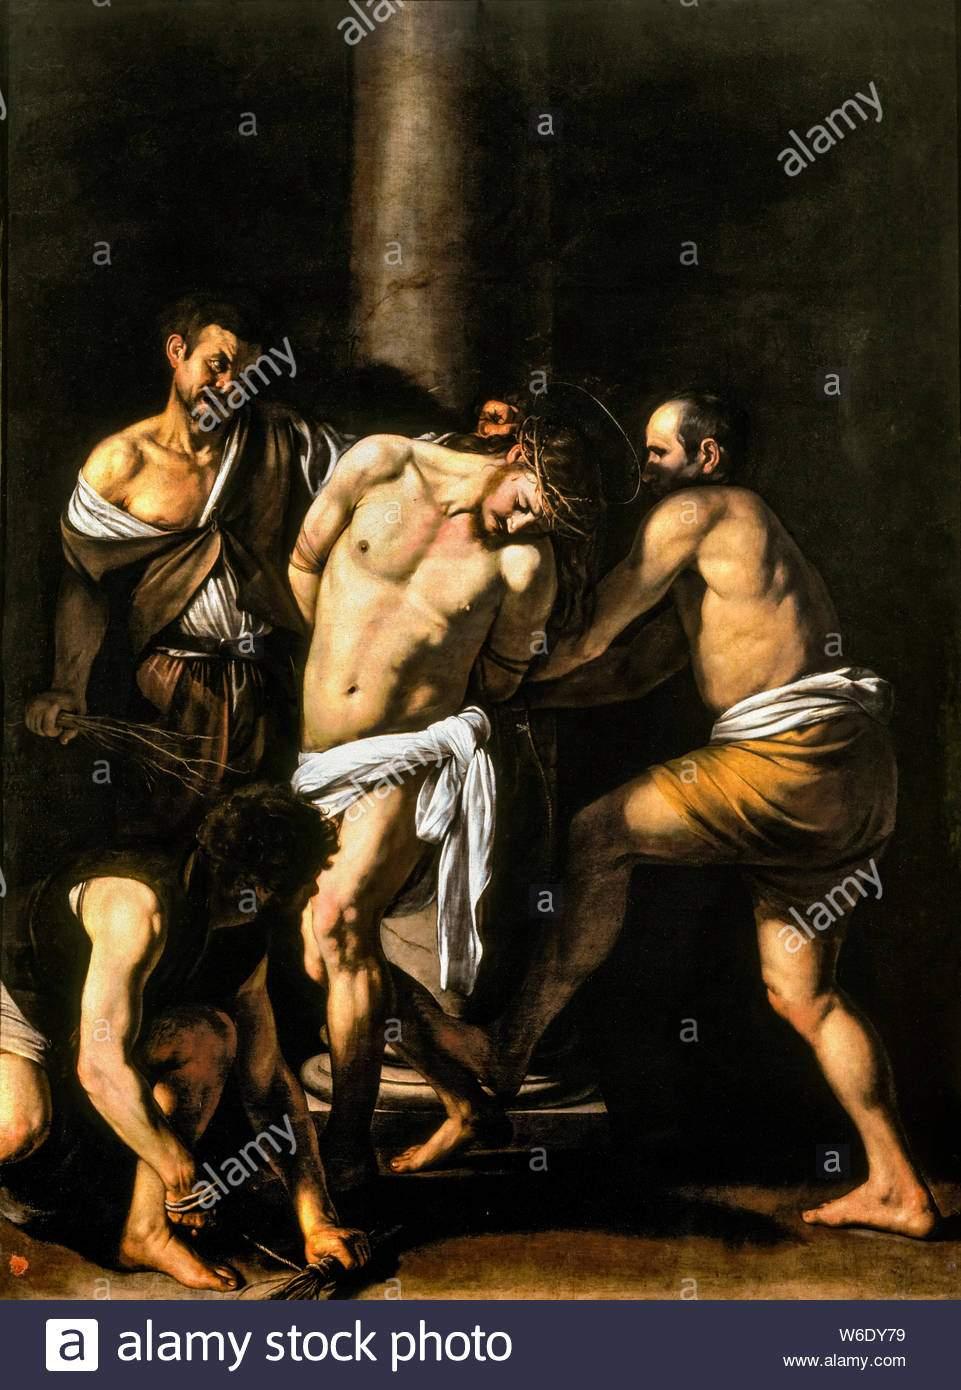 caravaggio-la-peinture-la-flagellation-du-christ-1607-w6dy79